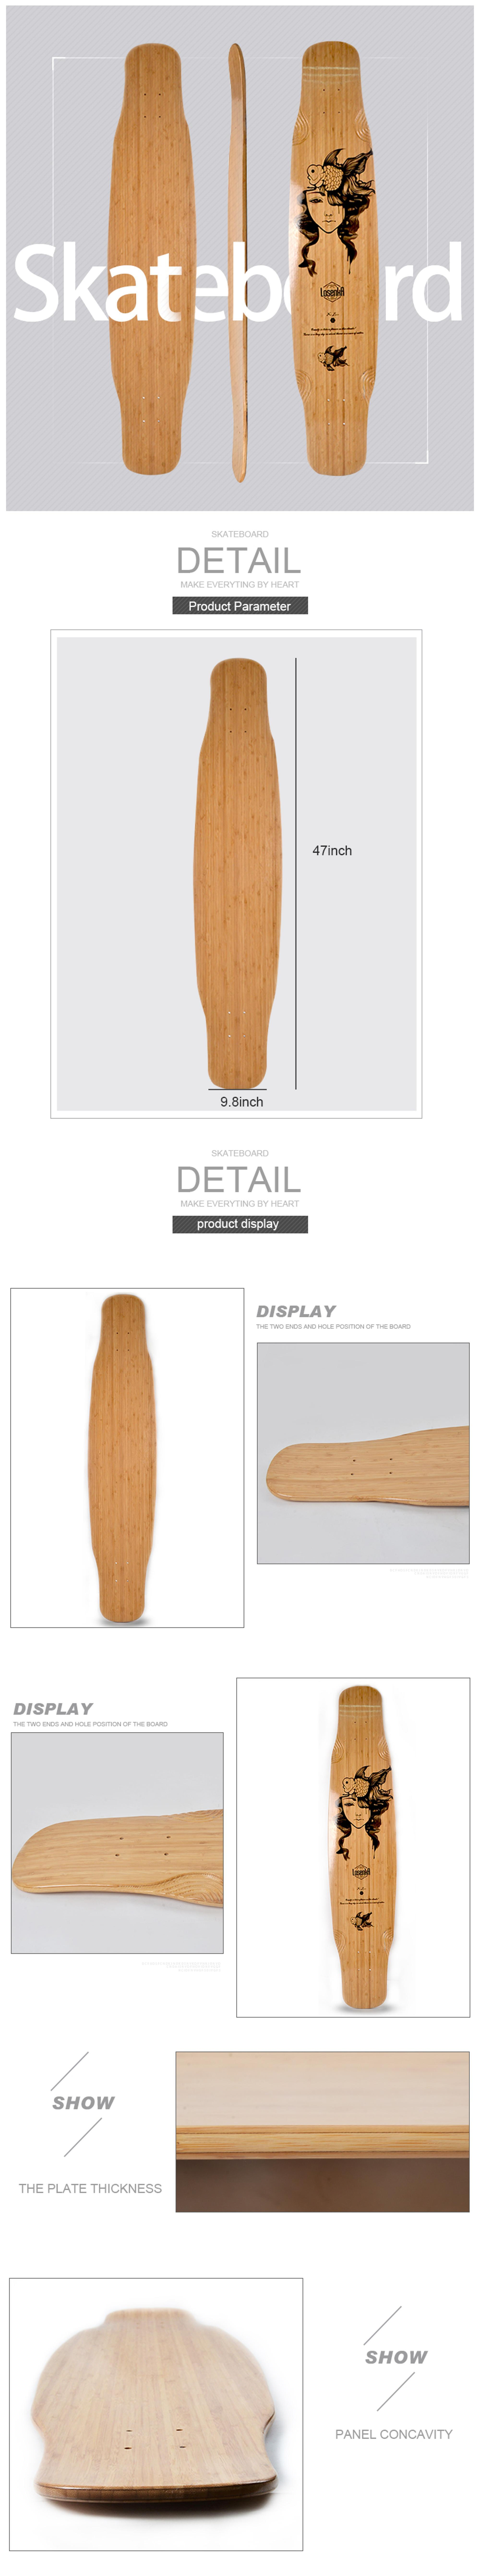 skate de longboard de bambu da grama da fibra do skate diy